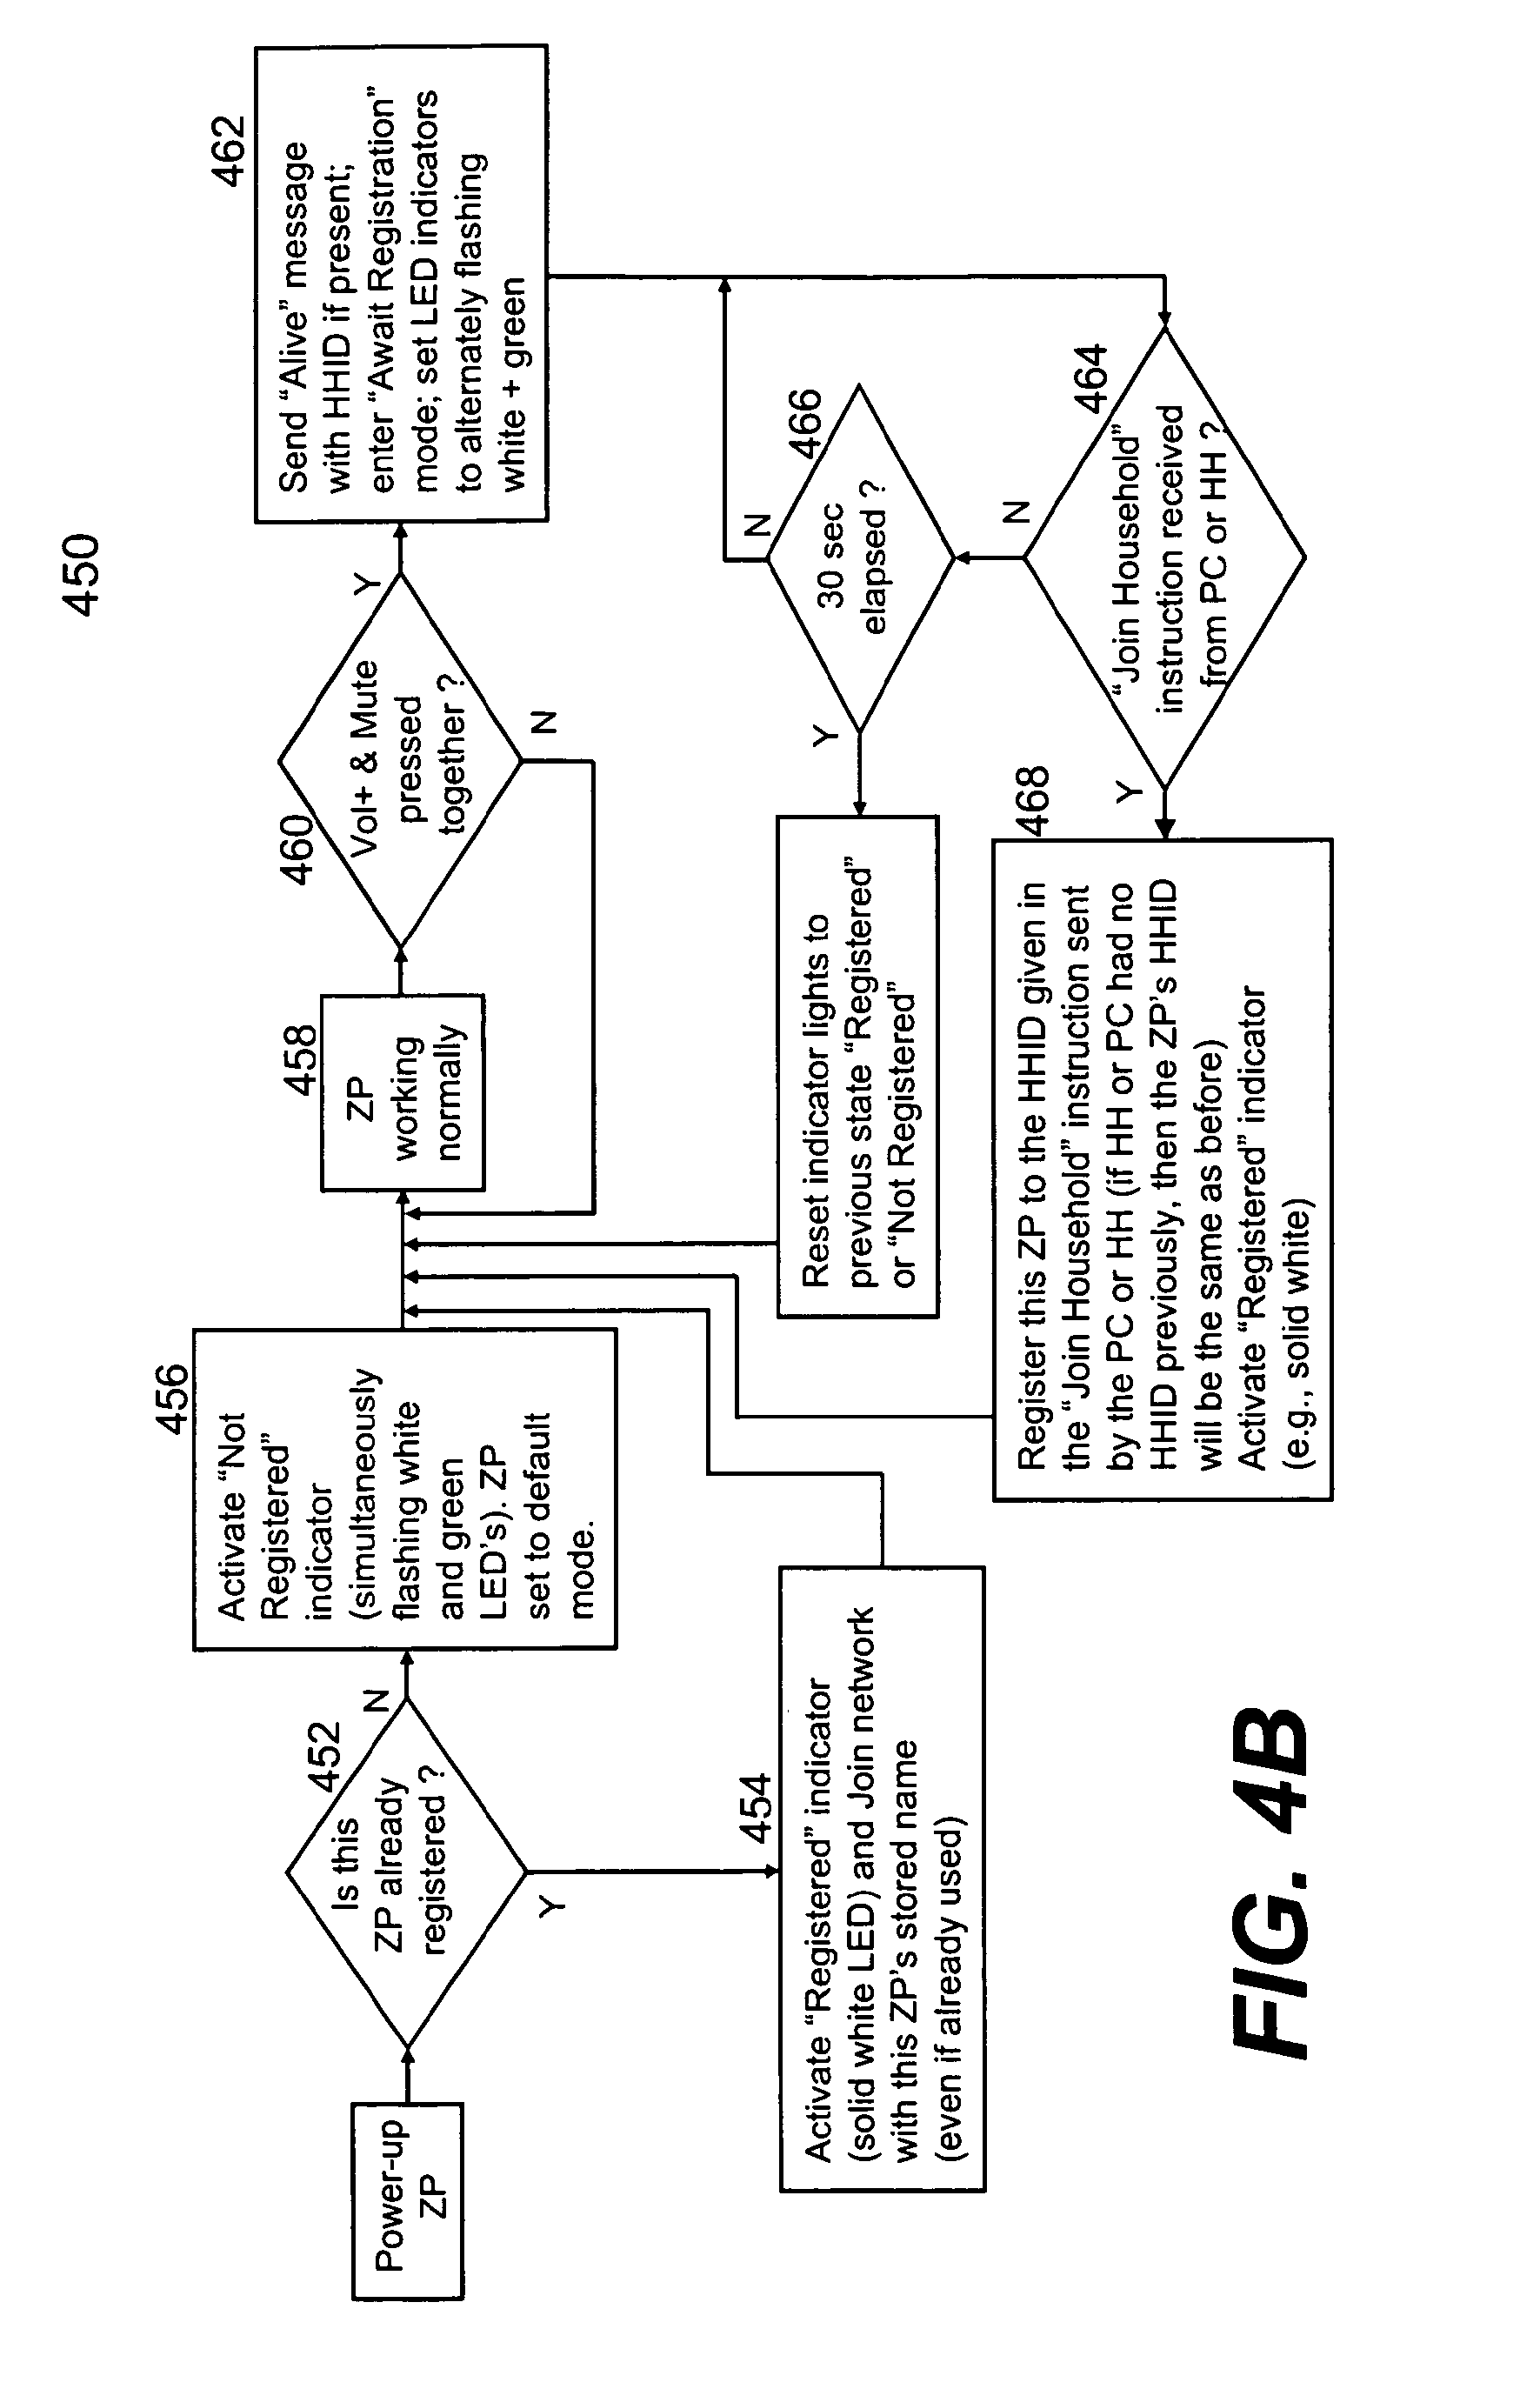 Patent US 9,787,550 B2 on